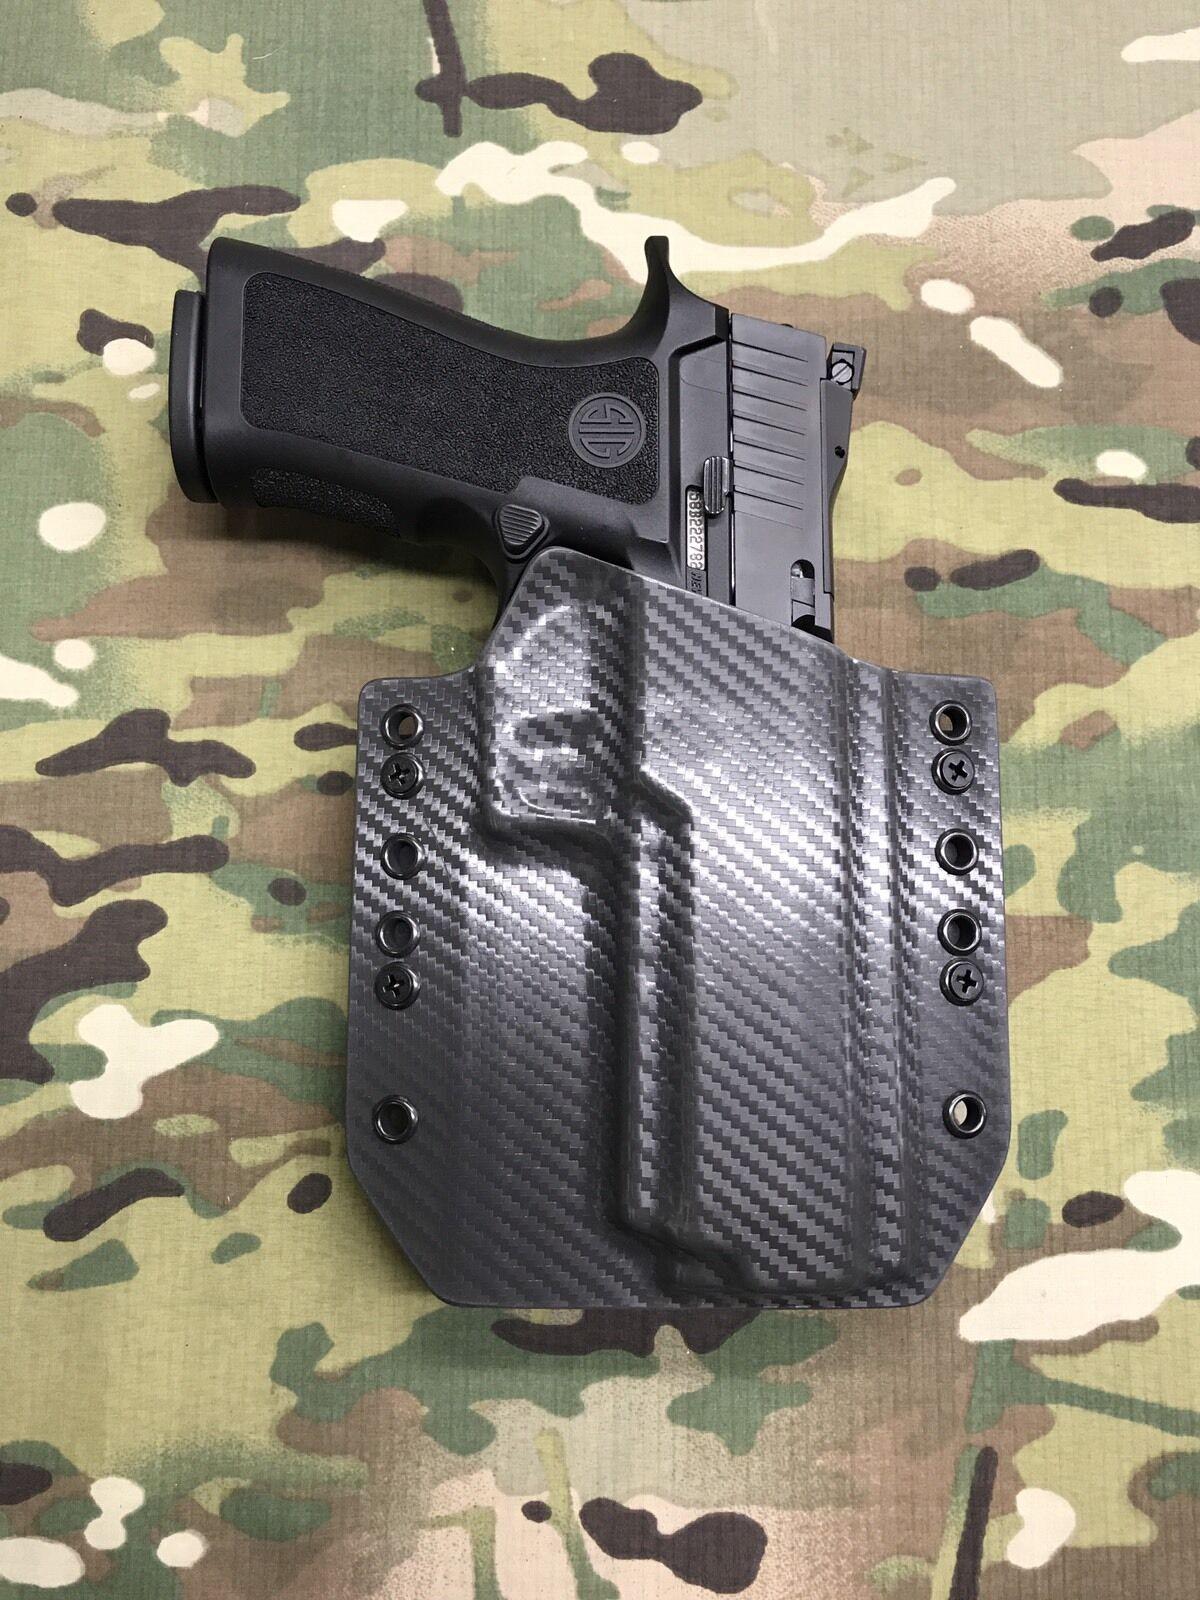 Armor grau Carbon Fiber Kydex SIG P320 Full Größe Holster